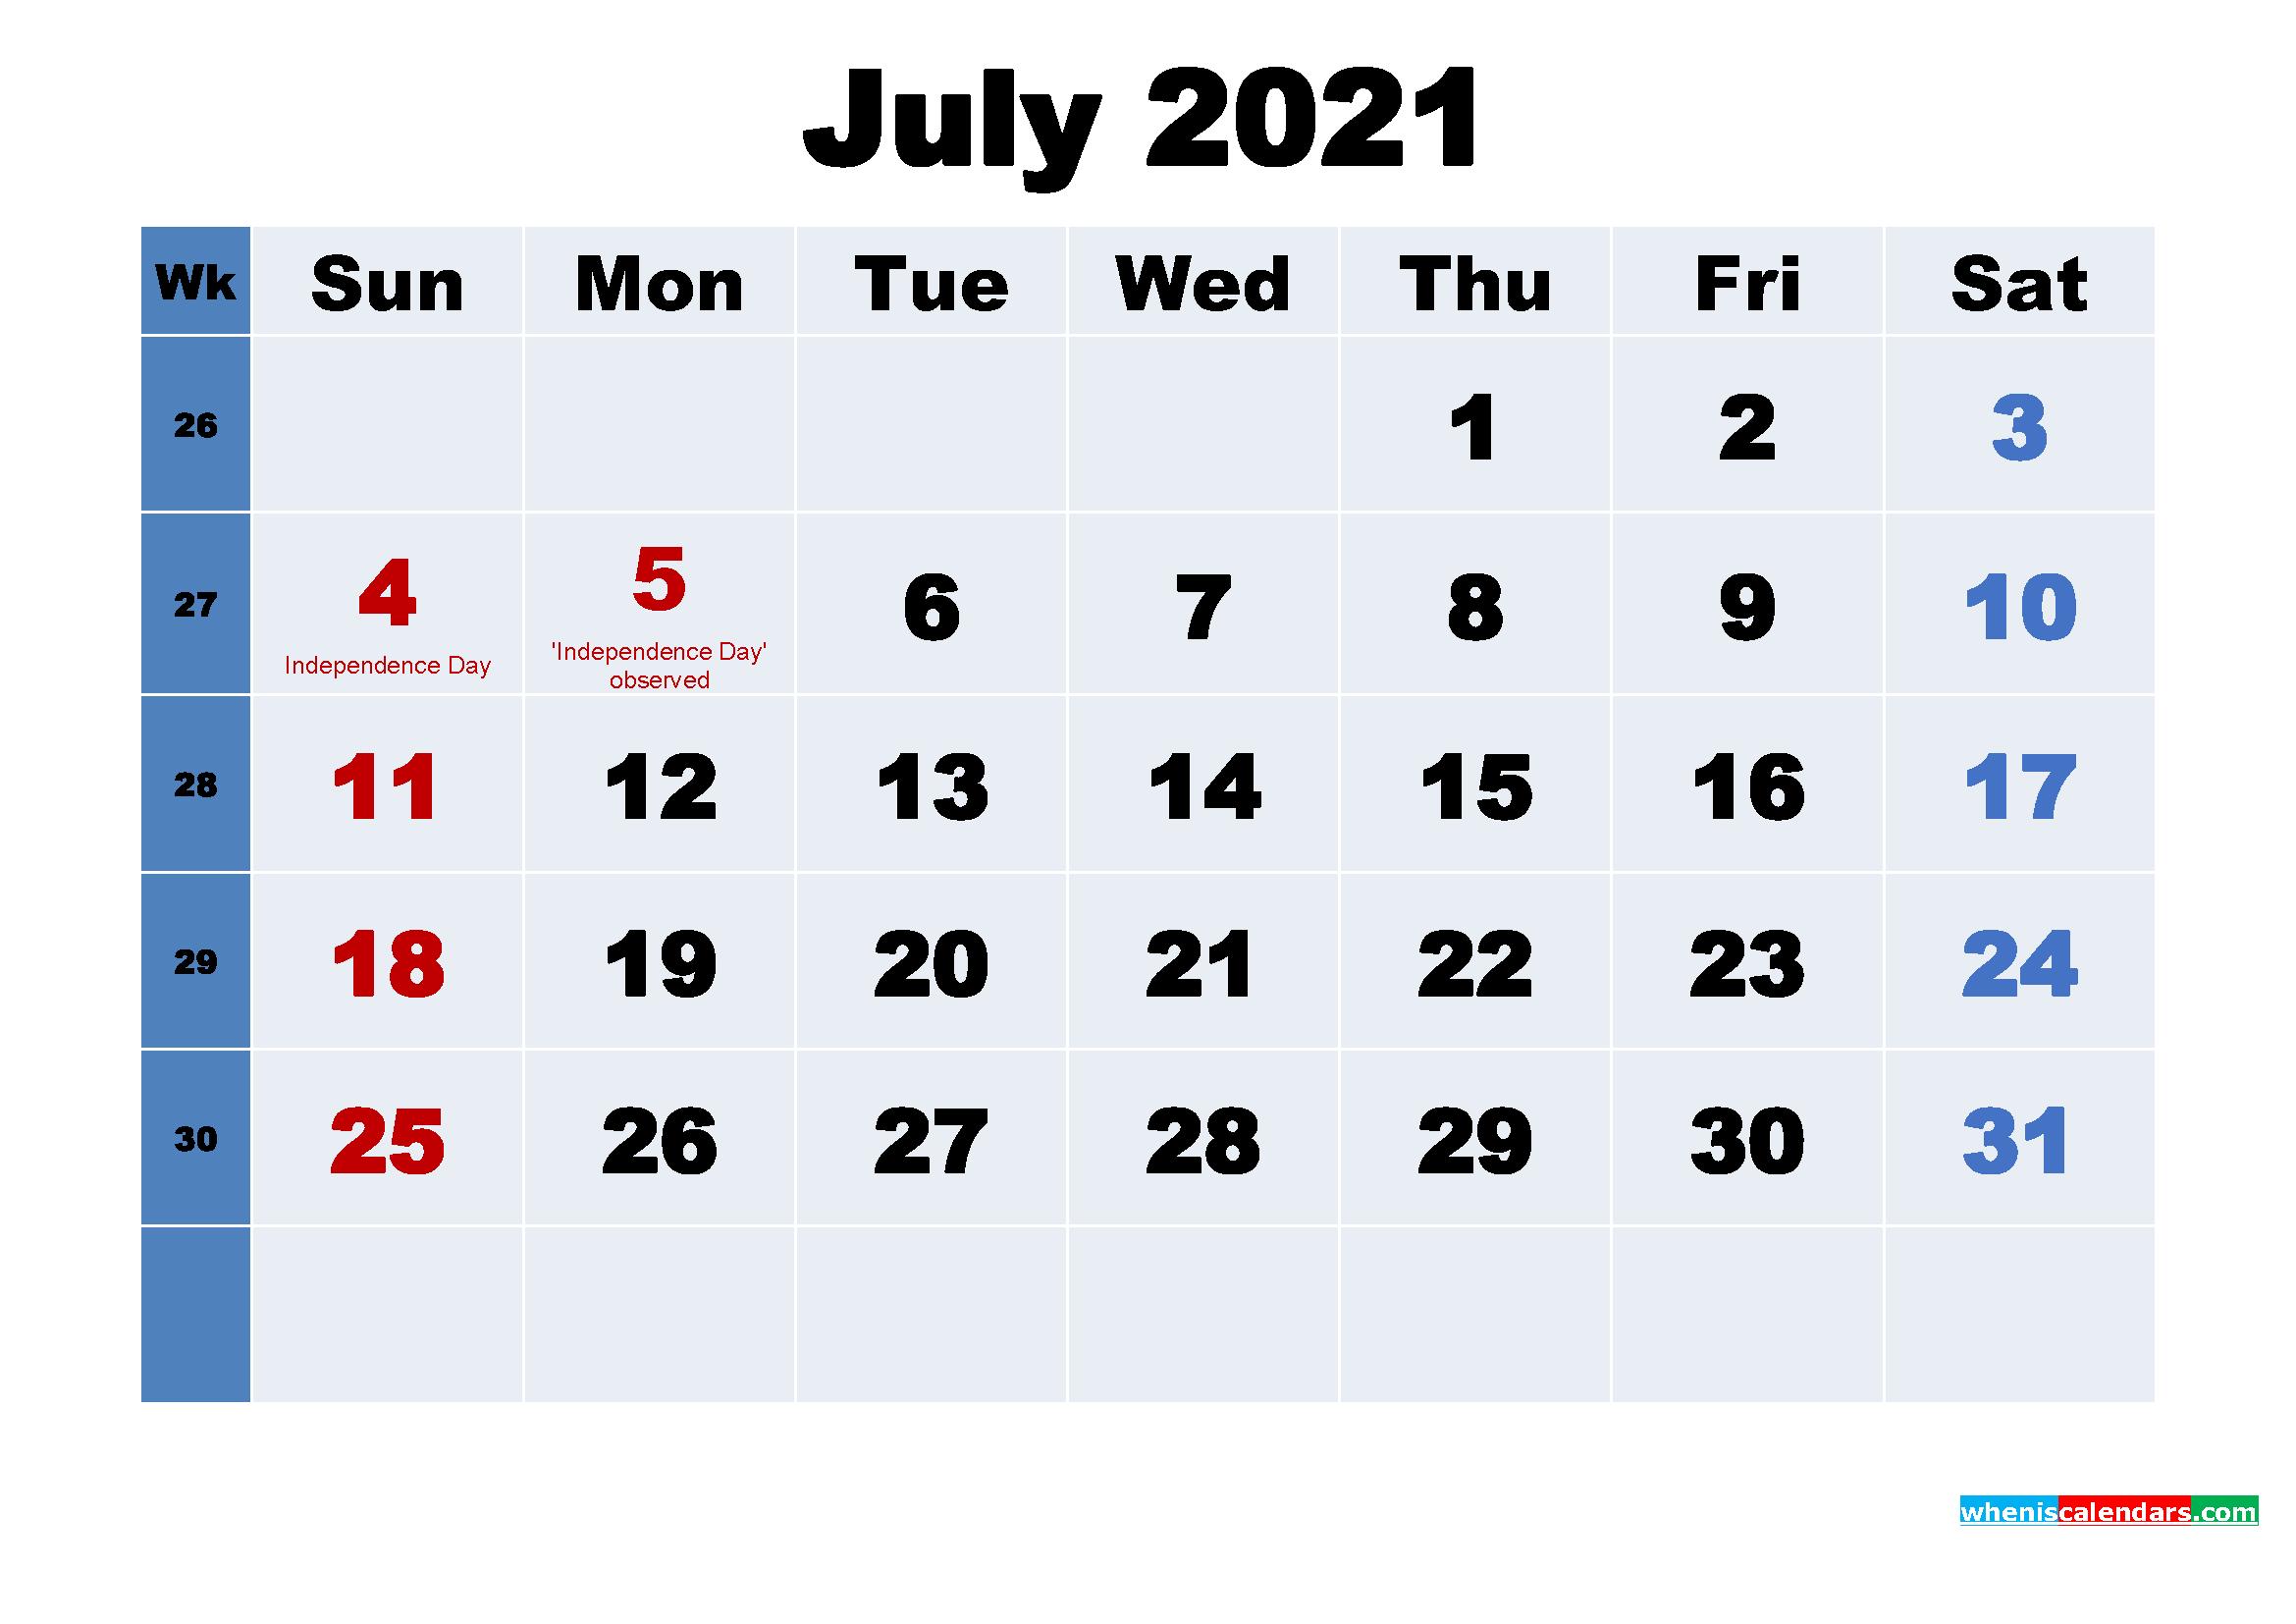 July 2021 Desktop Calendar with Holidays